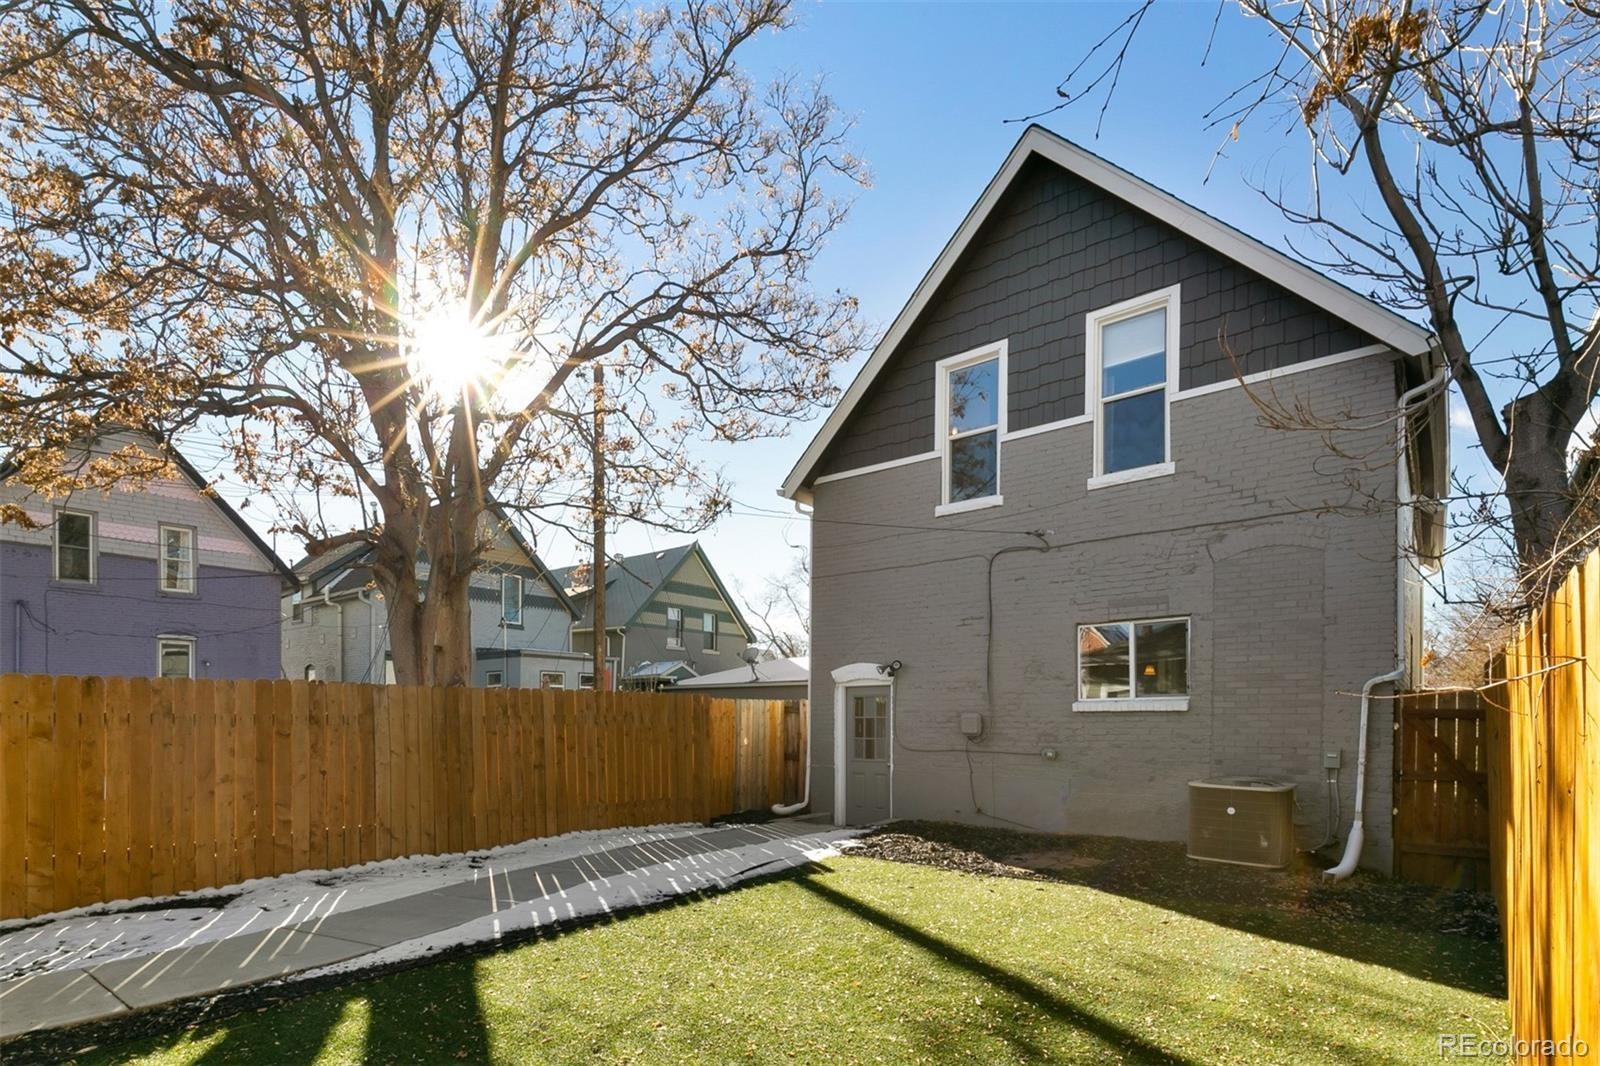 MLS# 7644495 - 27 - 2816 N High Street, Denver, CO 80205